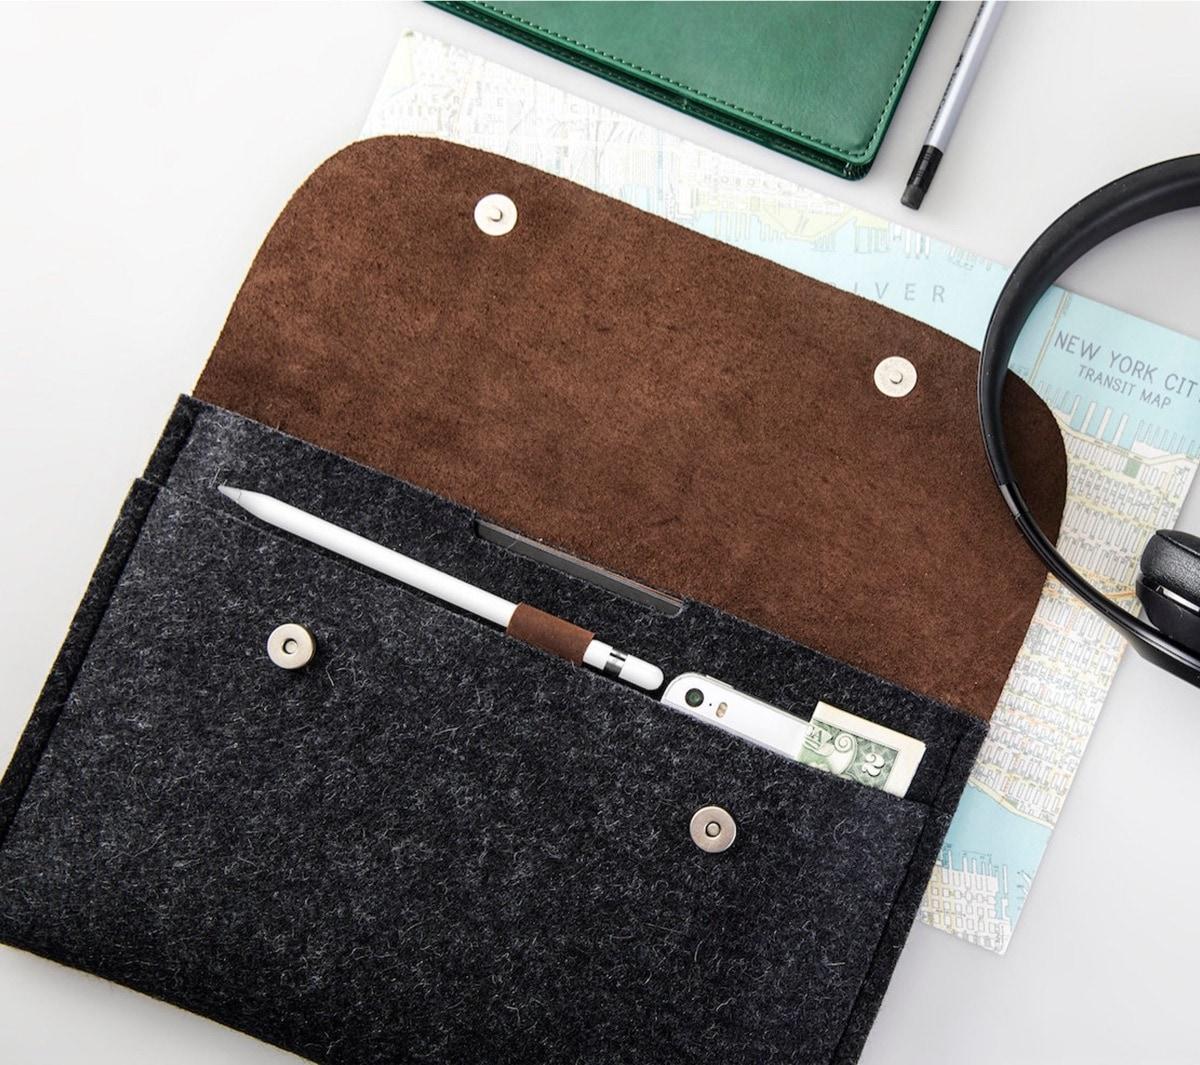 Premium leather and felt sleeve with internal Apple Pencil holder